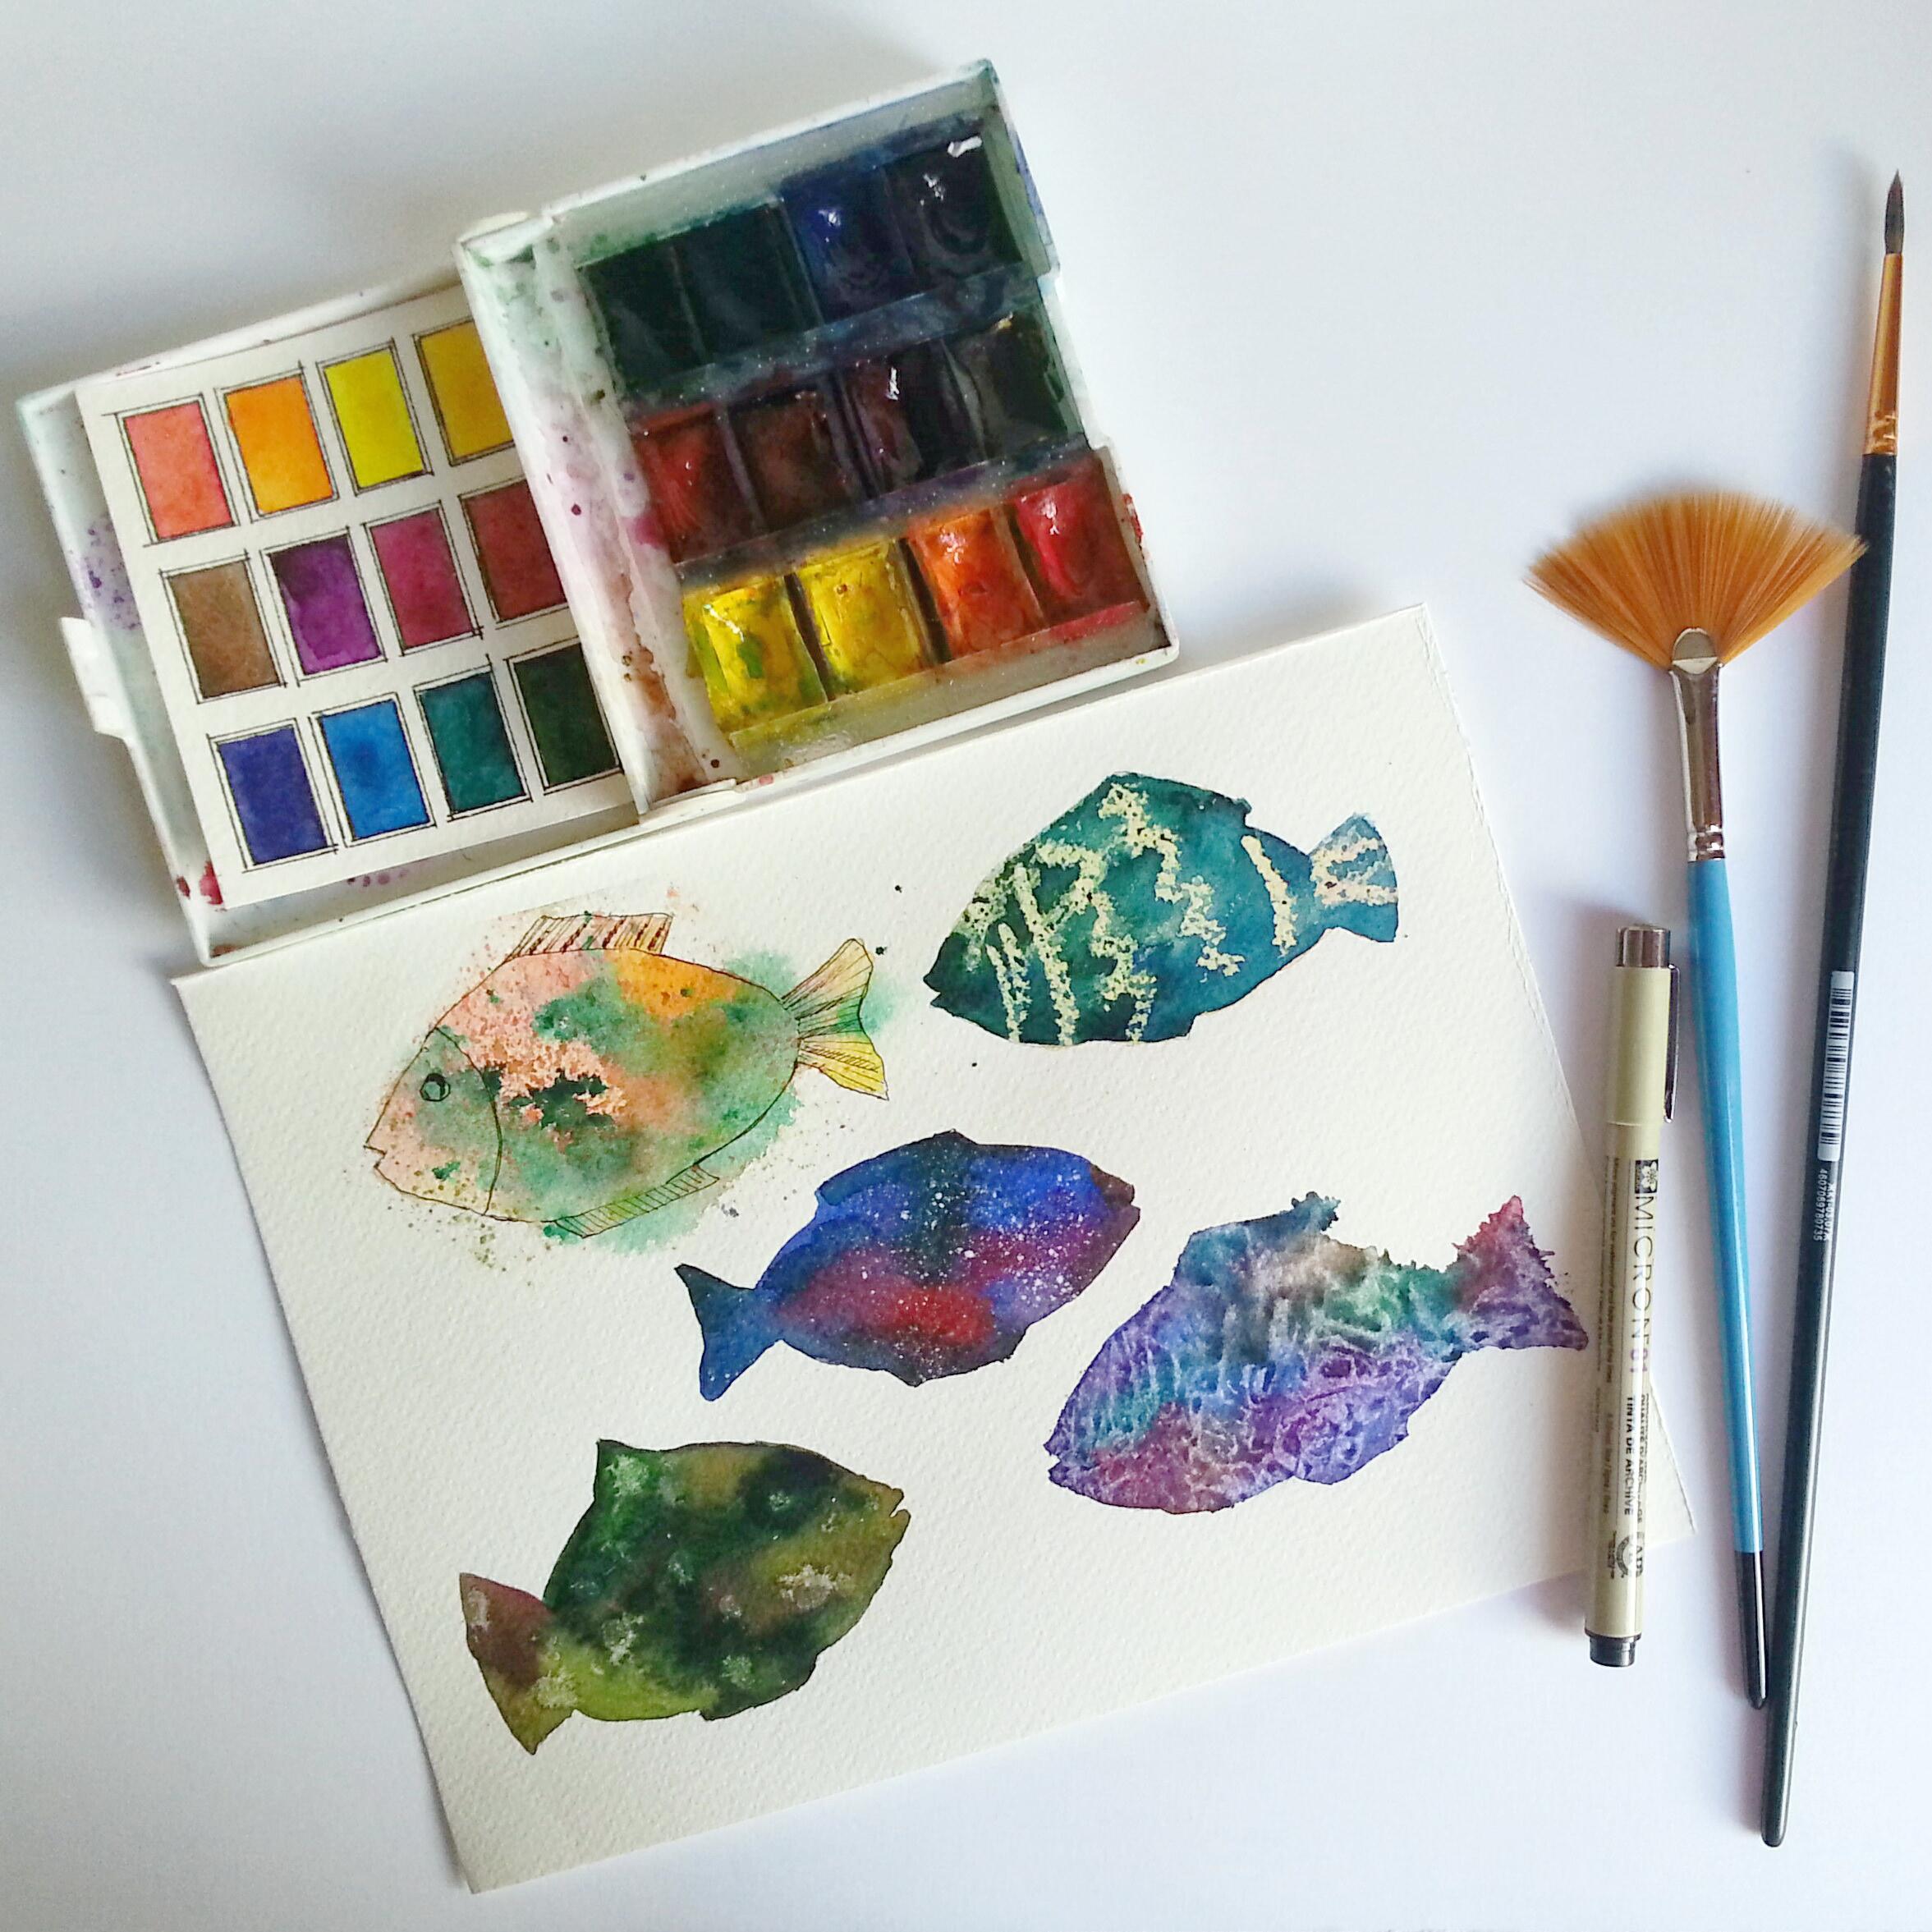 #WorldWatercolorGroup - Watercolor by Katiya Che of fish - #doodlewash